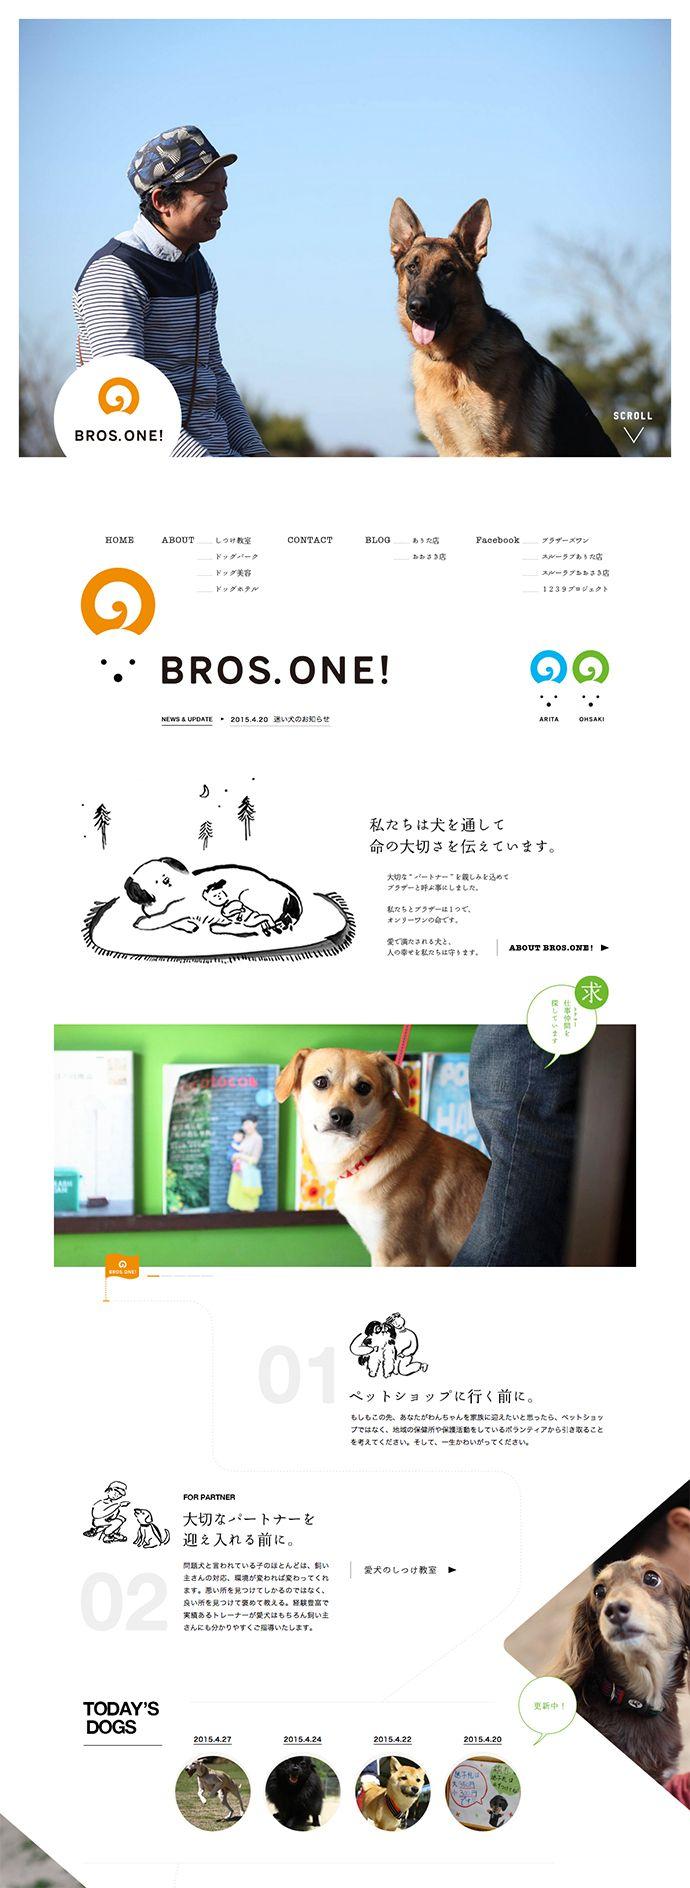 Web www.brosone.com http://www.oniguili.jp/